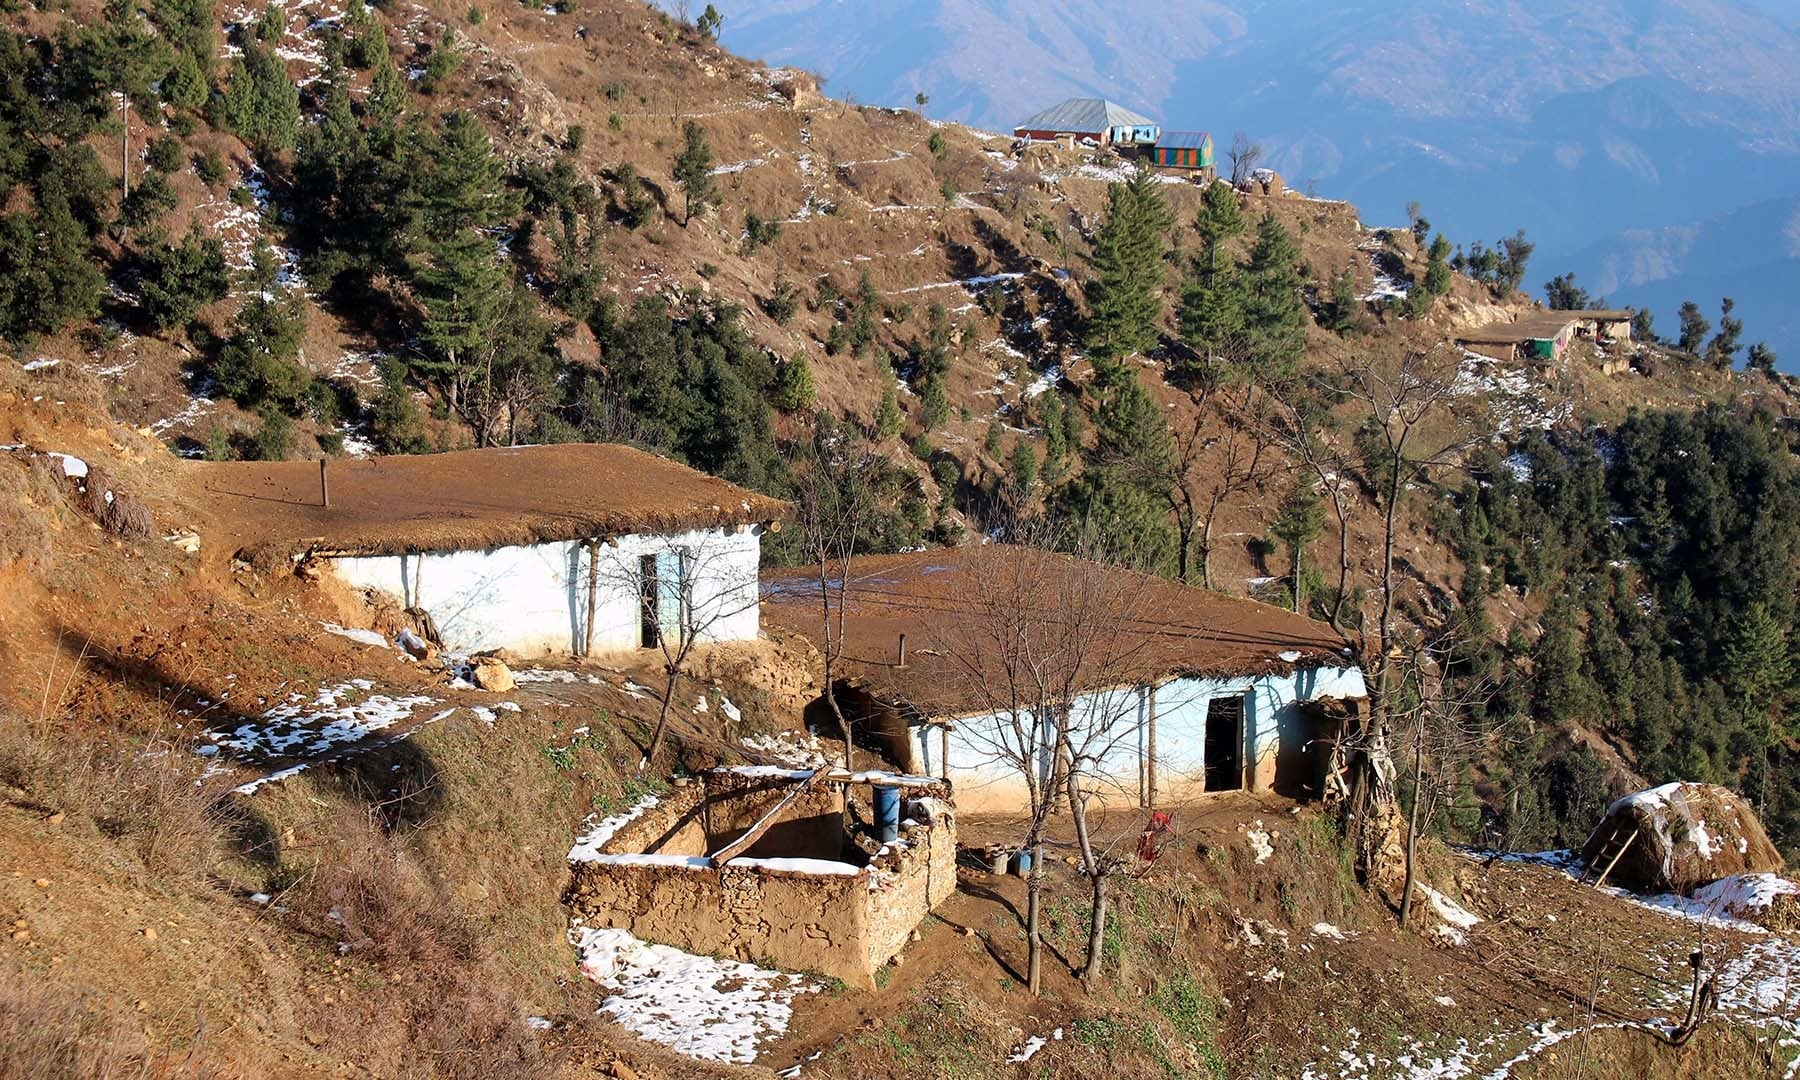 Simple mud houses in Ranzra village decorate the area near Jenako Maidan.